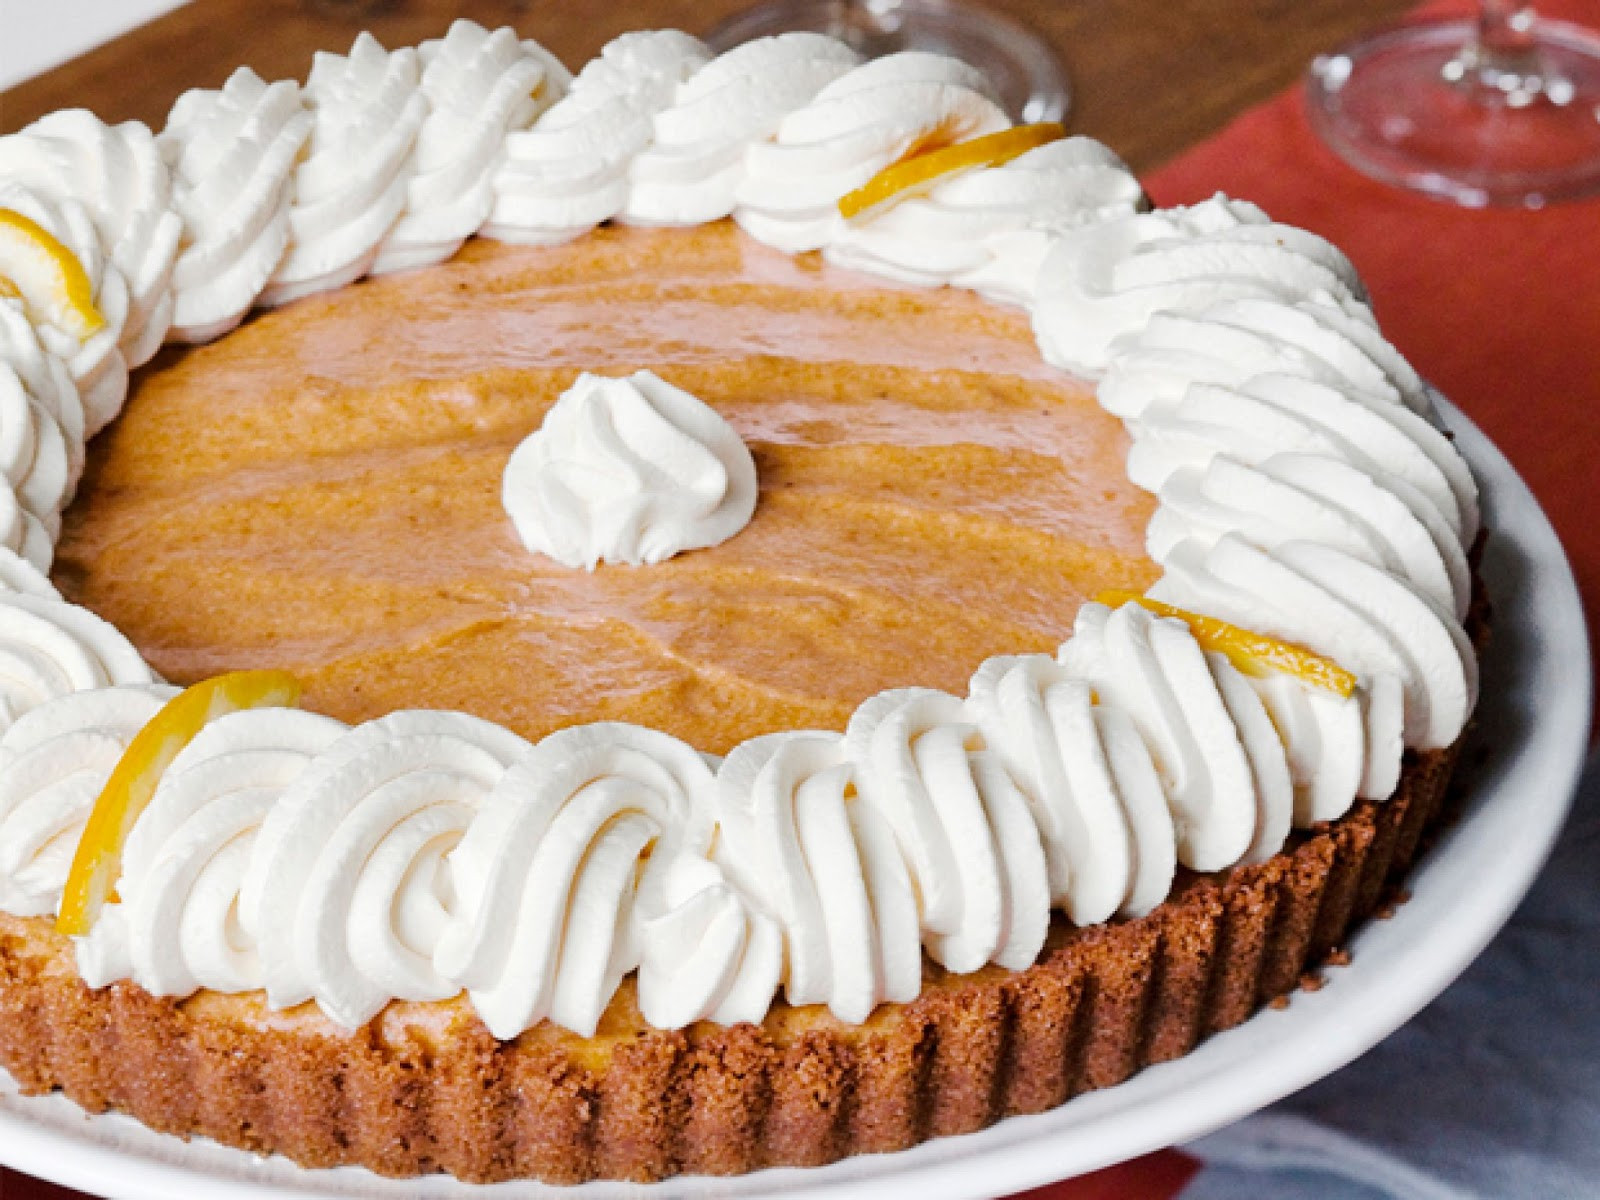 Ina Garten Pumpkin Pie  Jenny Steffens Hobick Last Days for Thanksgiving Orders